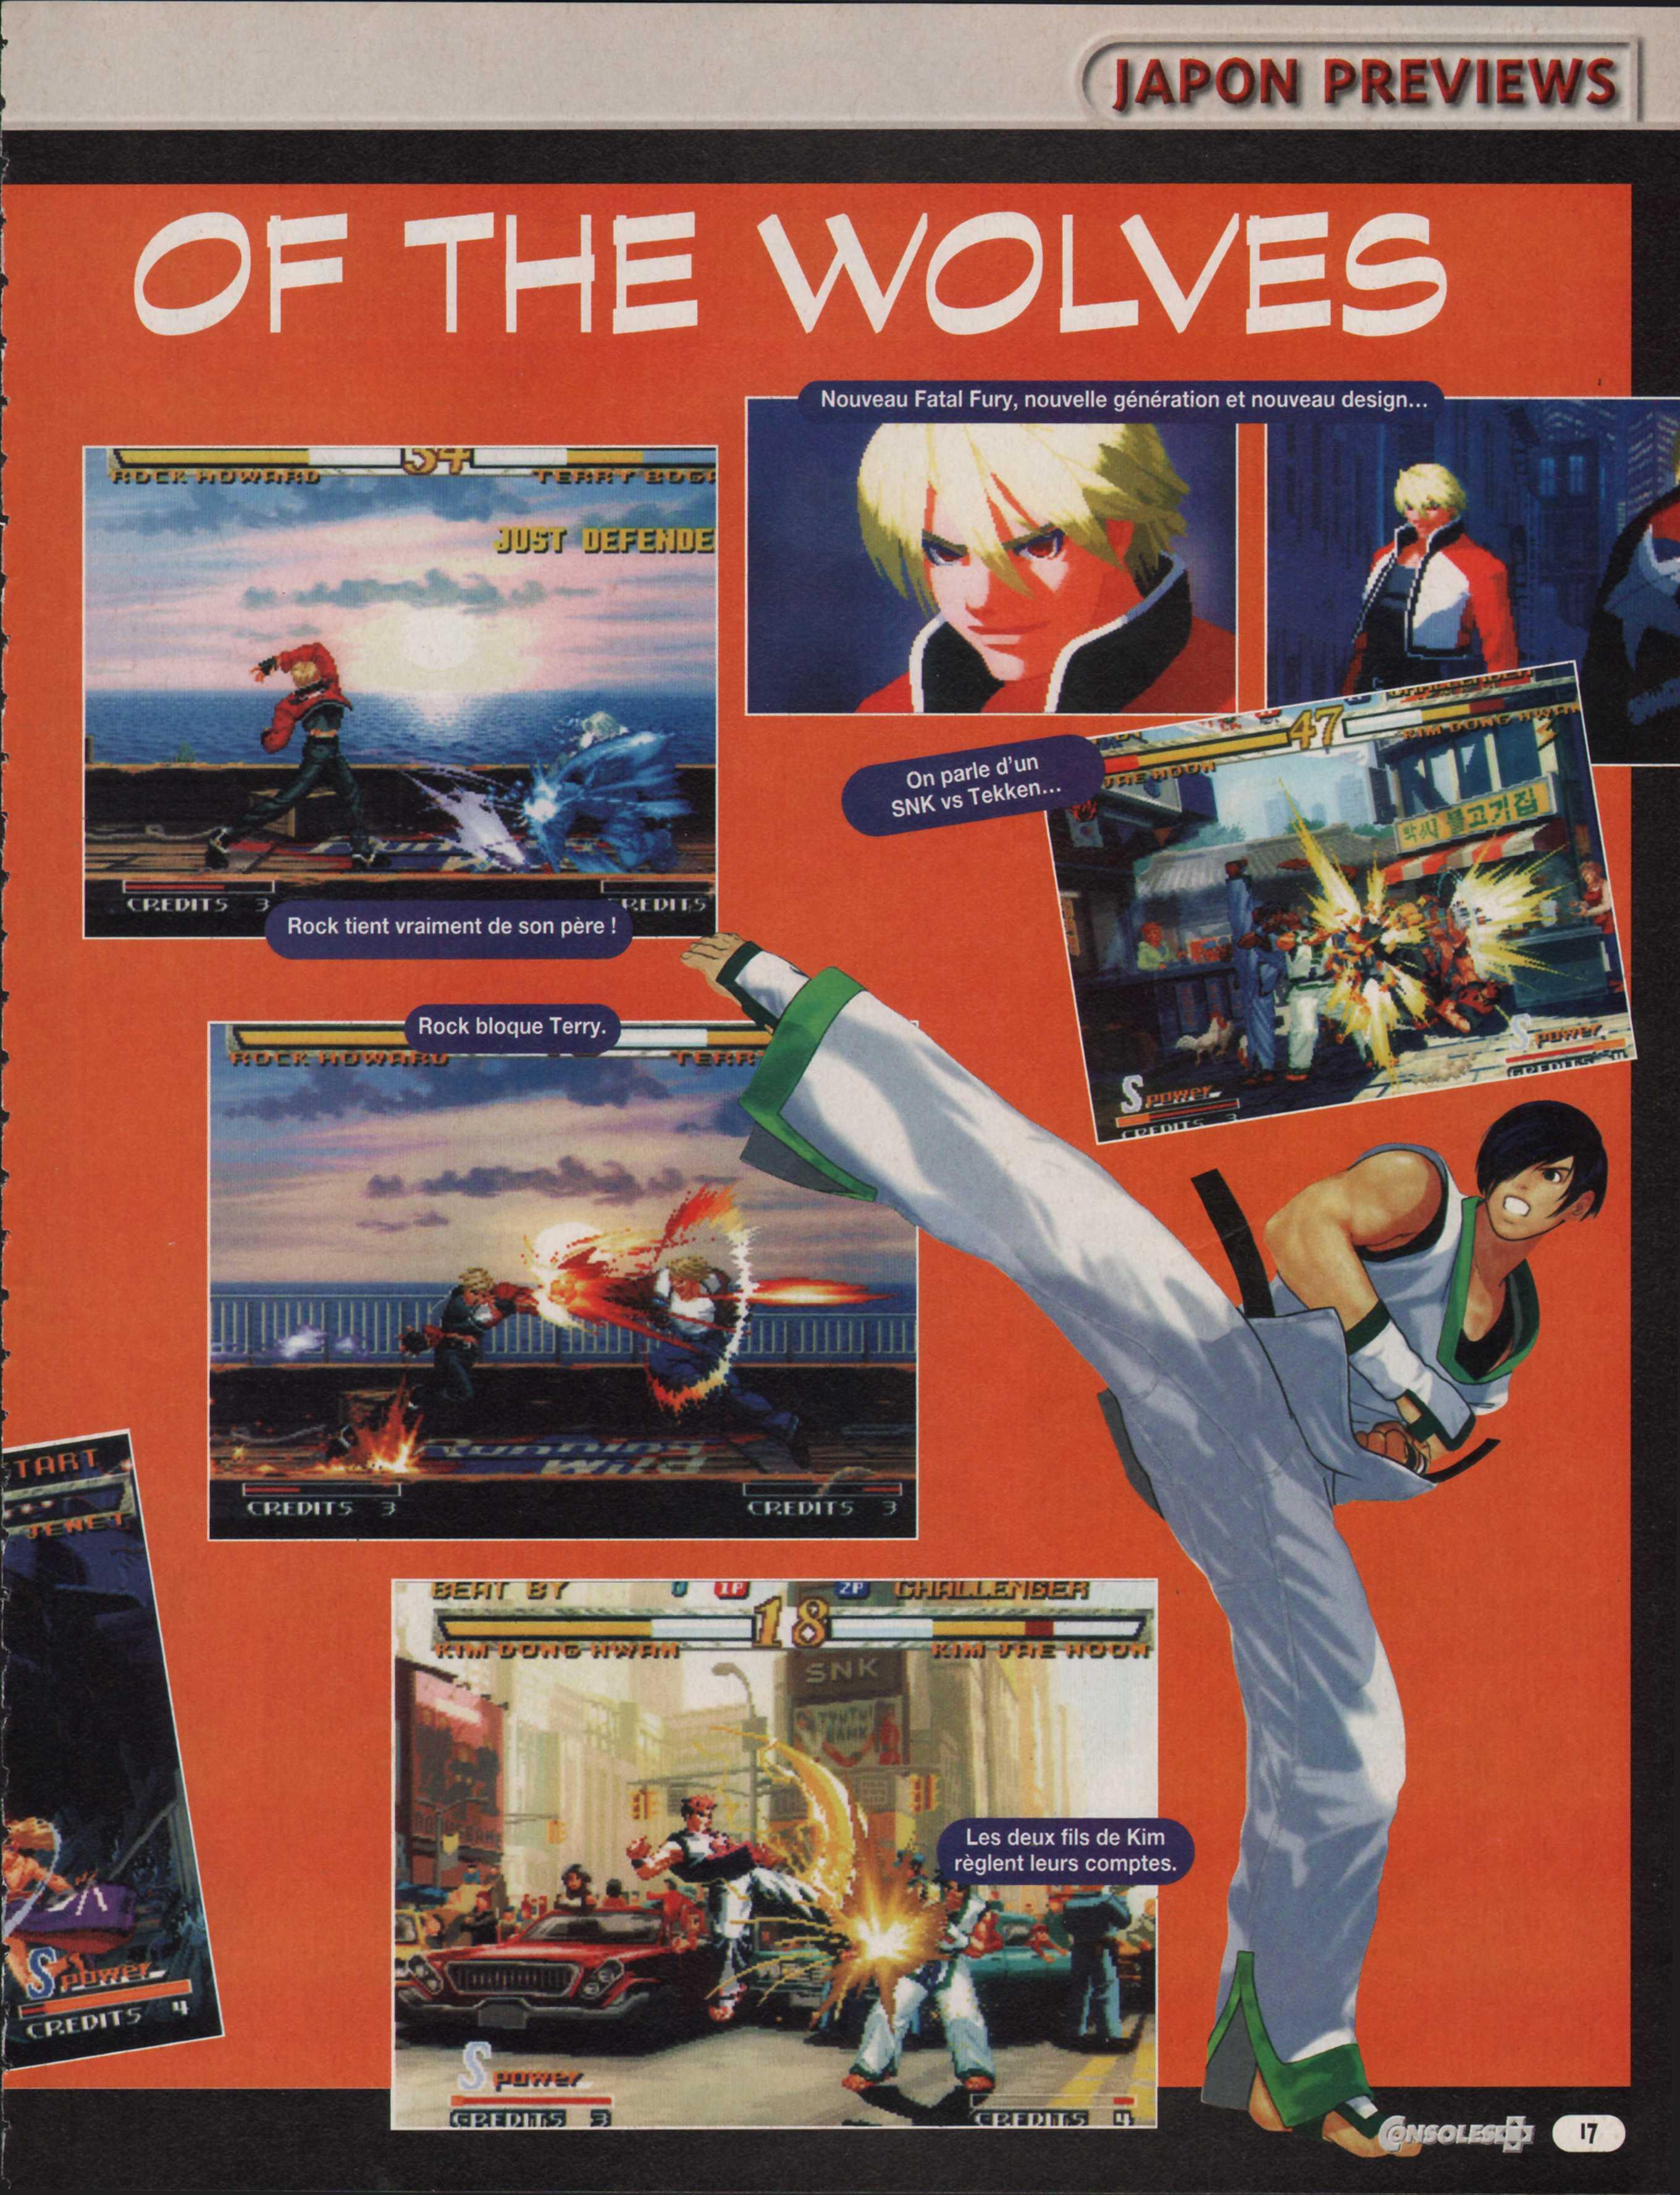 [NEOGEO] Garô: Mark Of The Wolves - Garou pour les intimes Consoles%2B%20096%20-%20Page%20017%20%282000-01%29